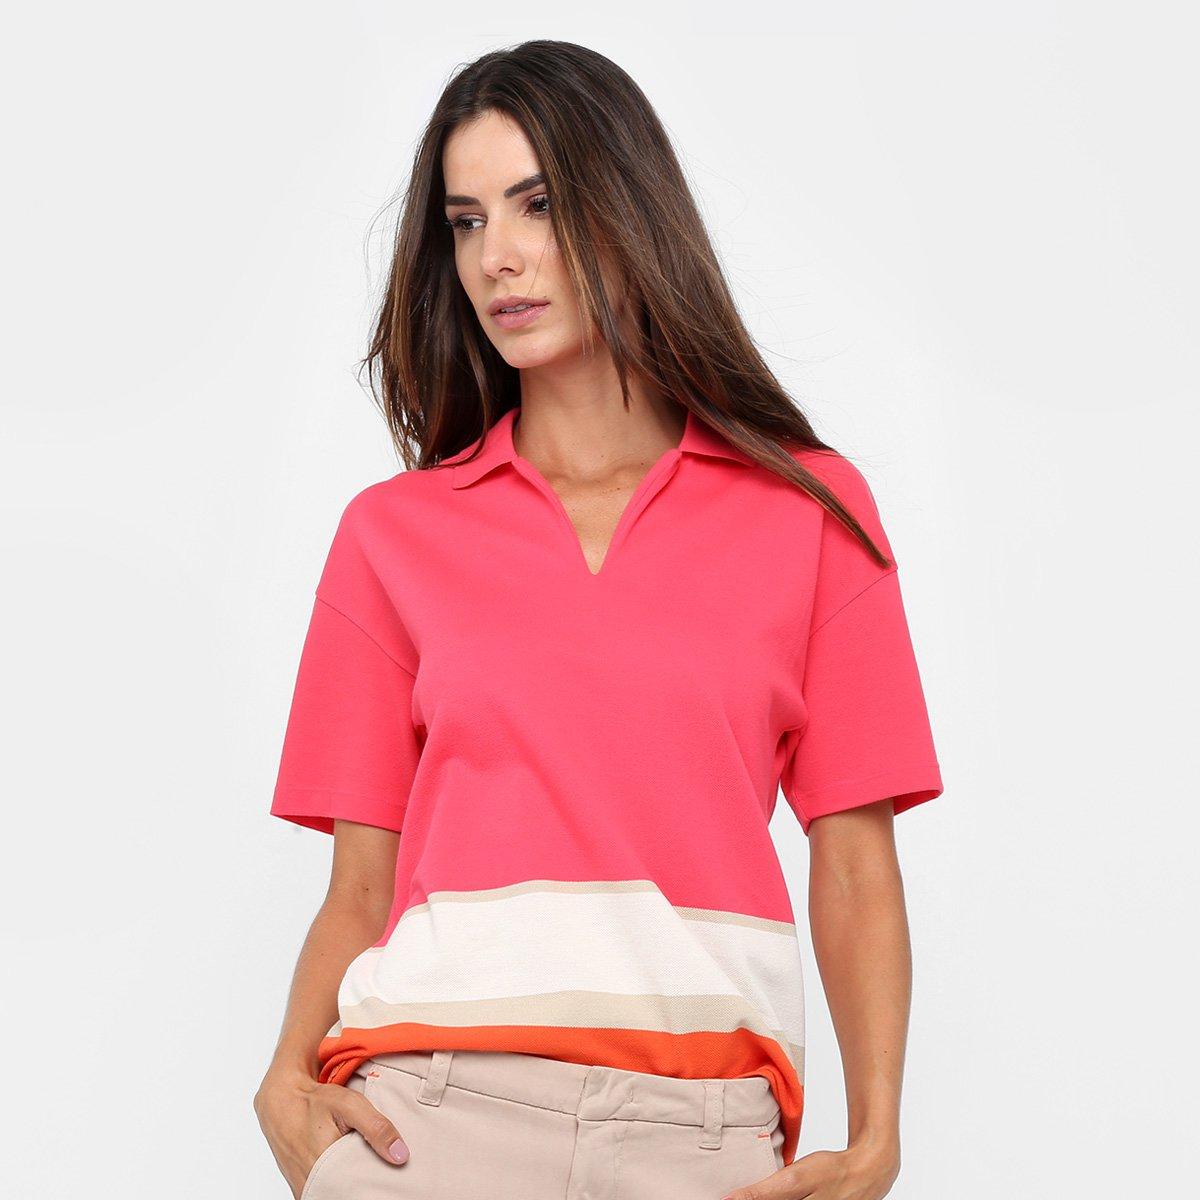 Camisa Polo Lacoste Listras Feminina - Compre Agora   Netshoes 1759961c41